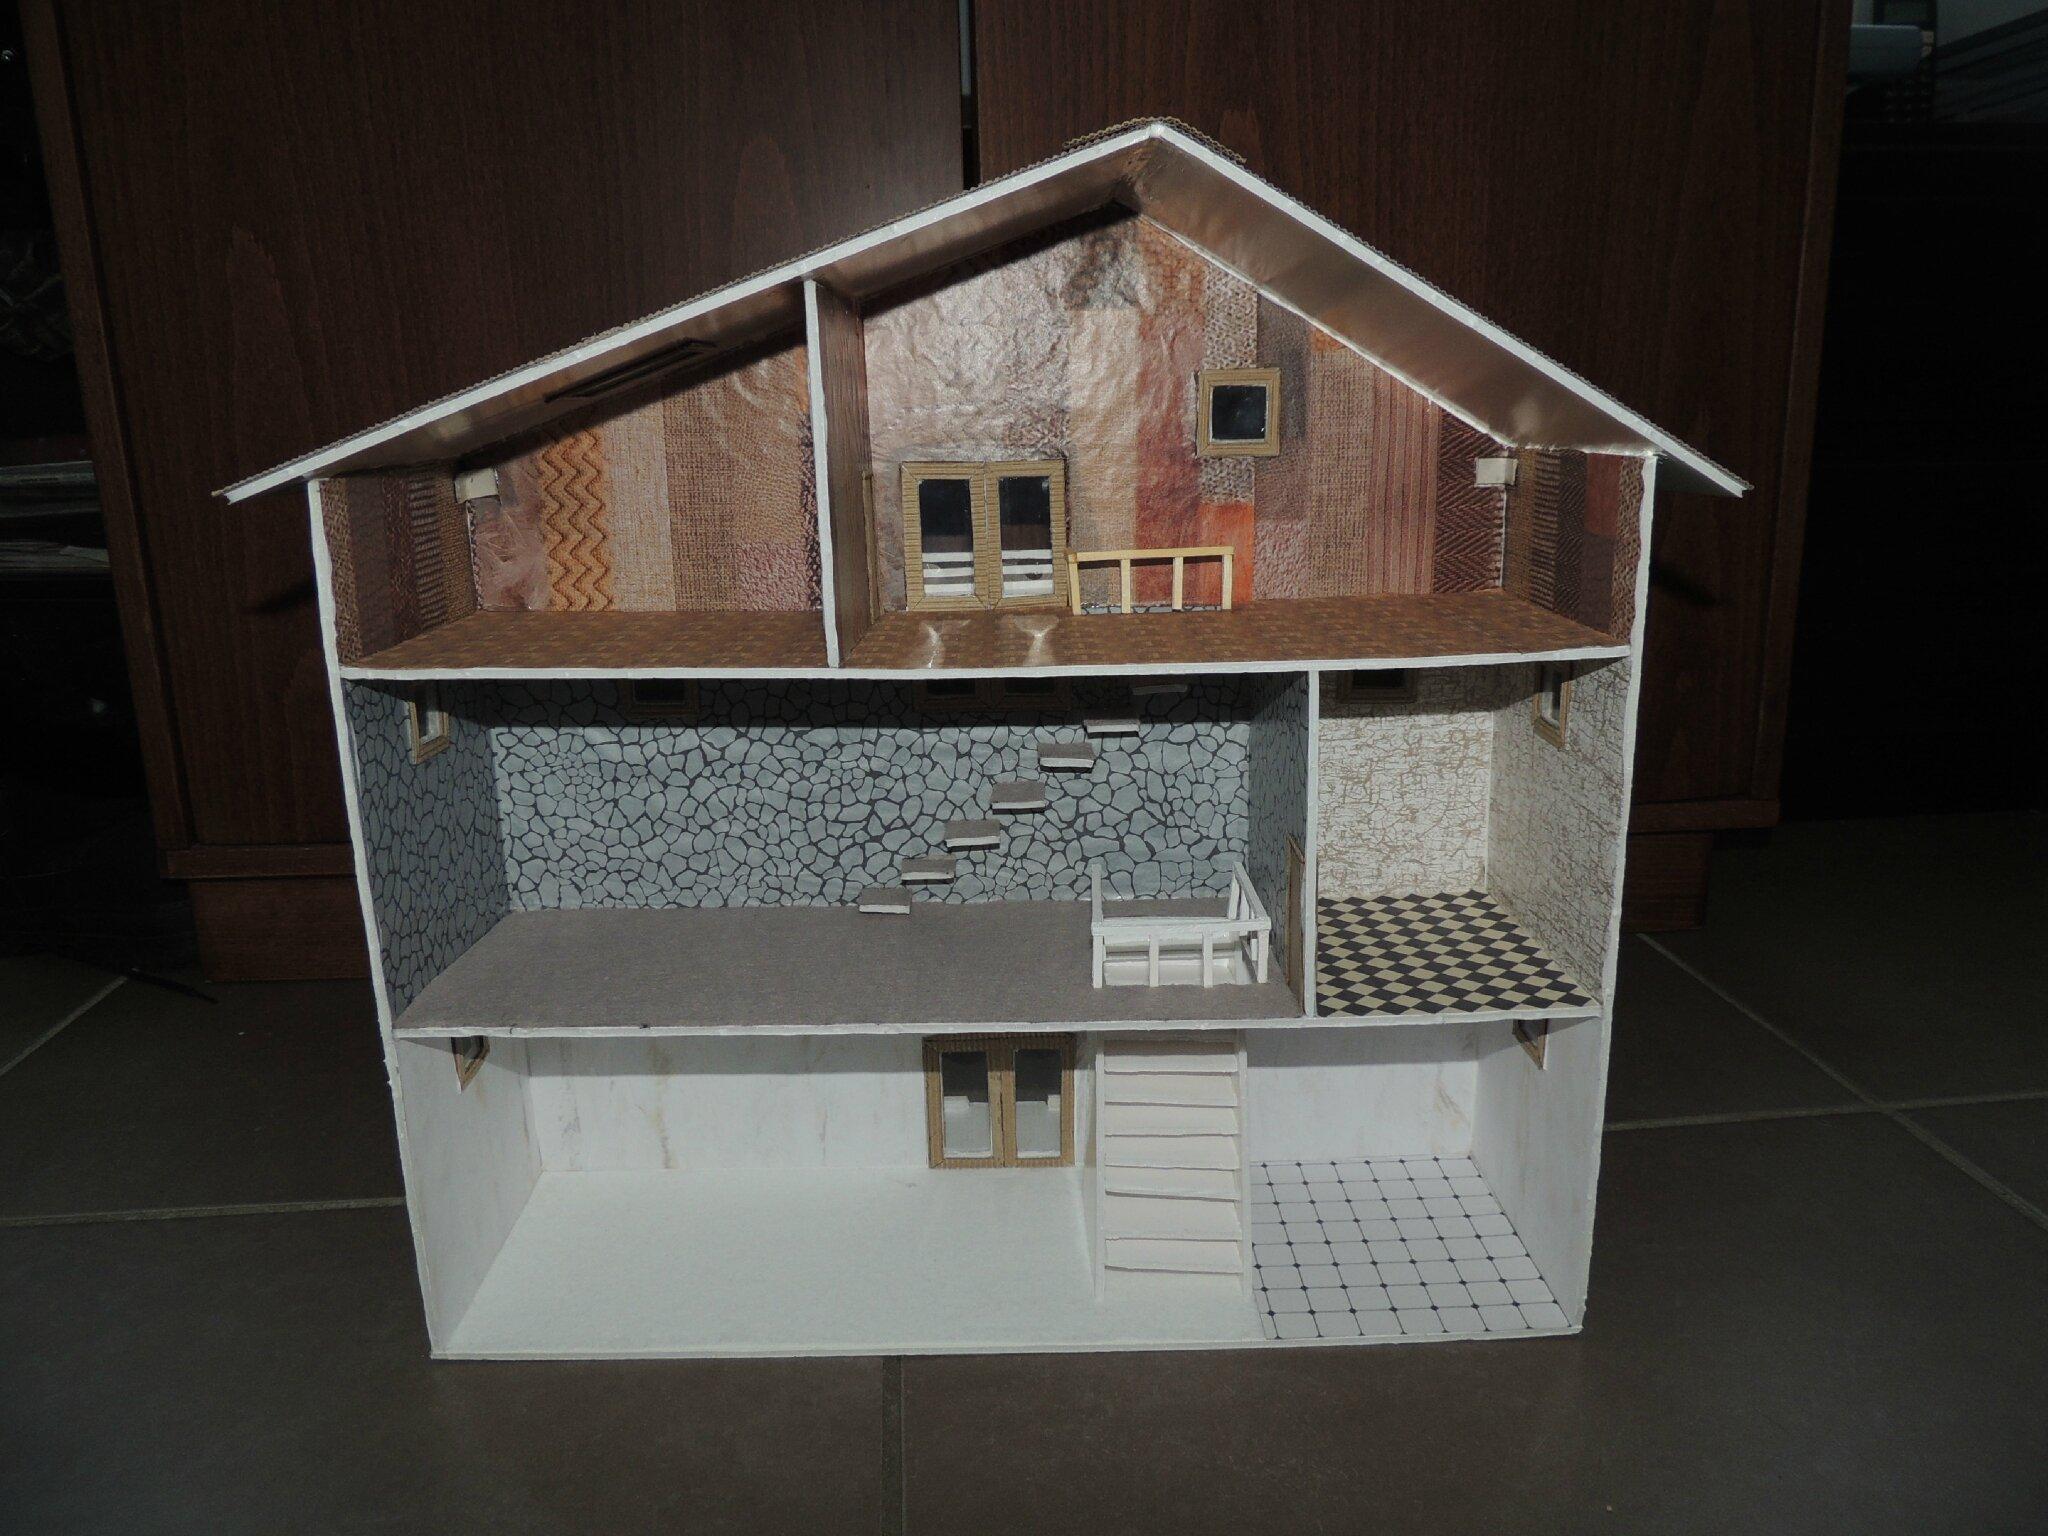 maison miniature tenshi 39 s creations. Black Bedroom Furniture Sets. Home Design Ideas